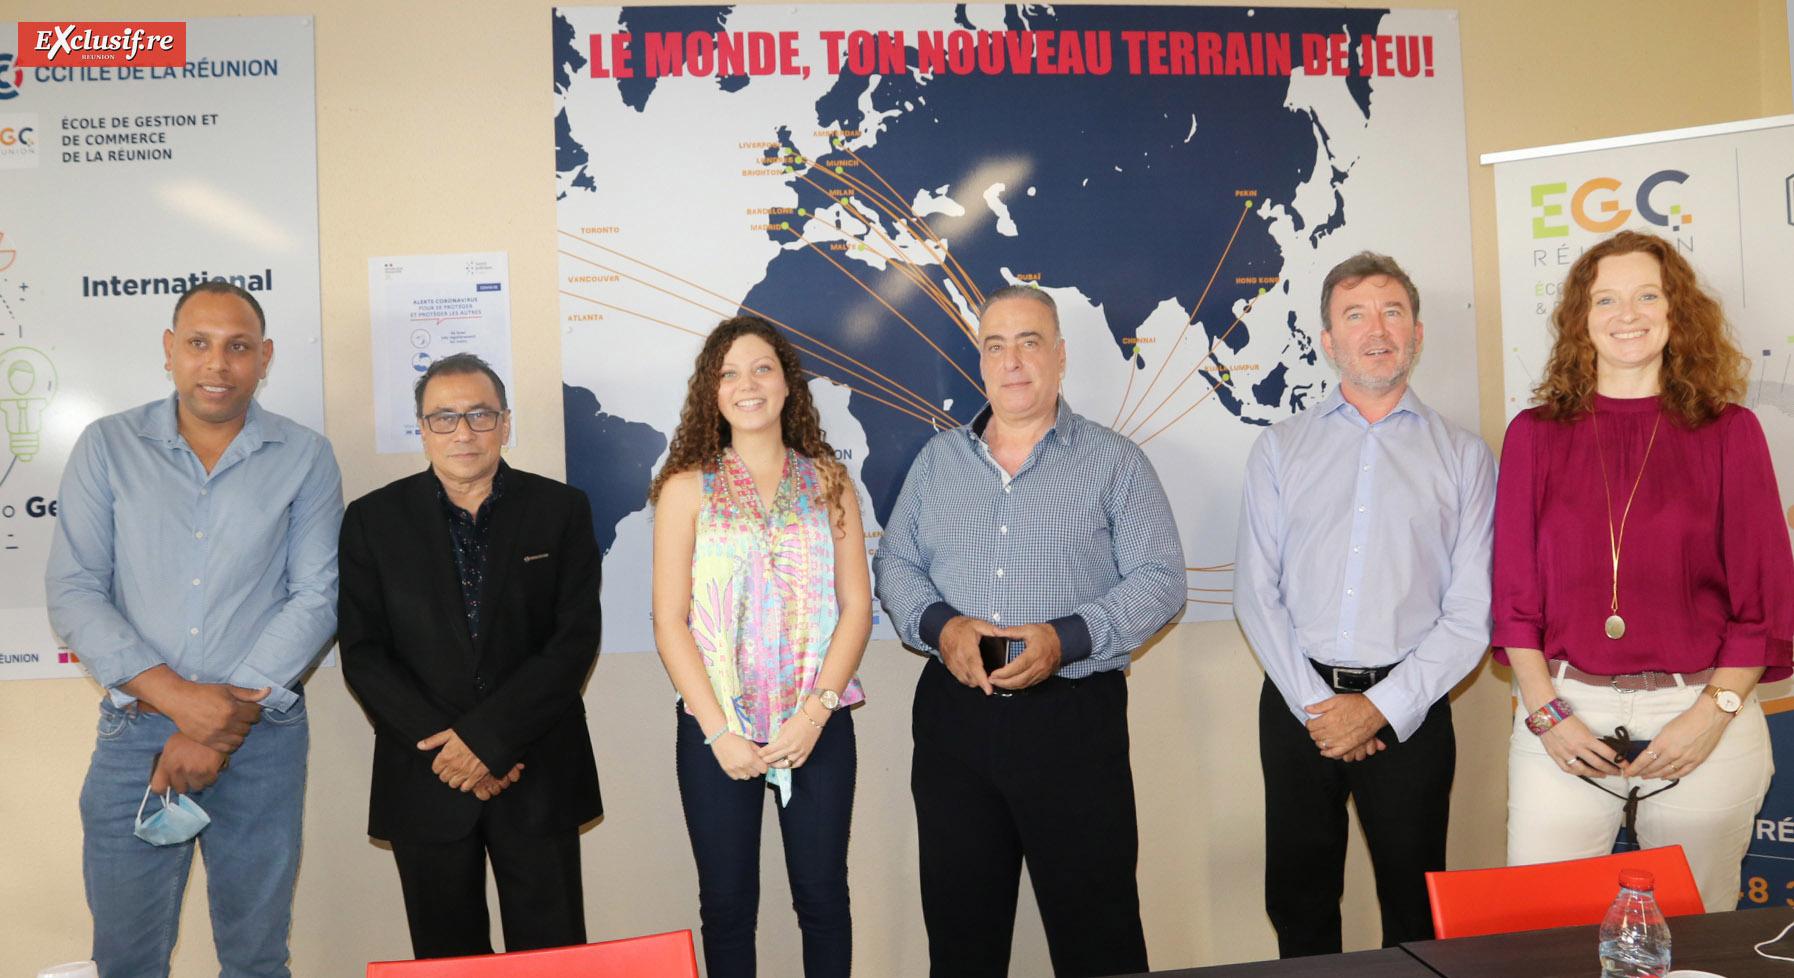 Pierrick Robert, Ibrahim Patel, Lisa, étudiante, Mansoor Zarif, et Philippe Bocquet